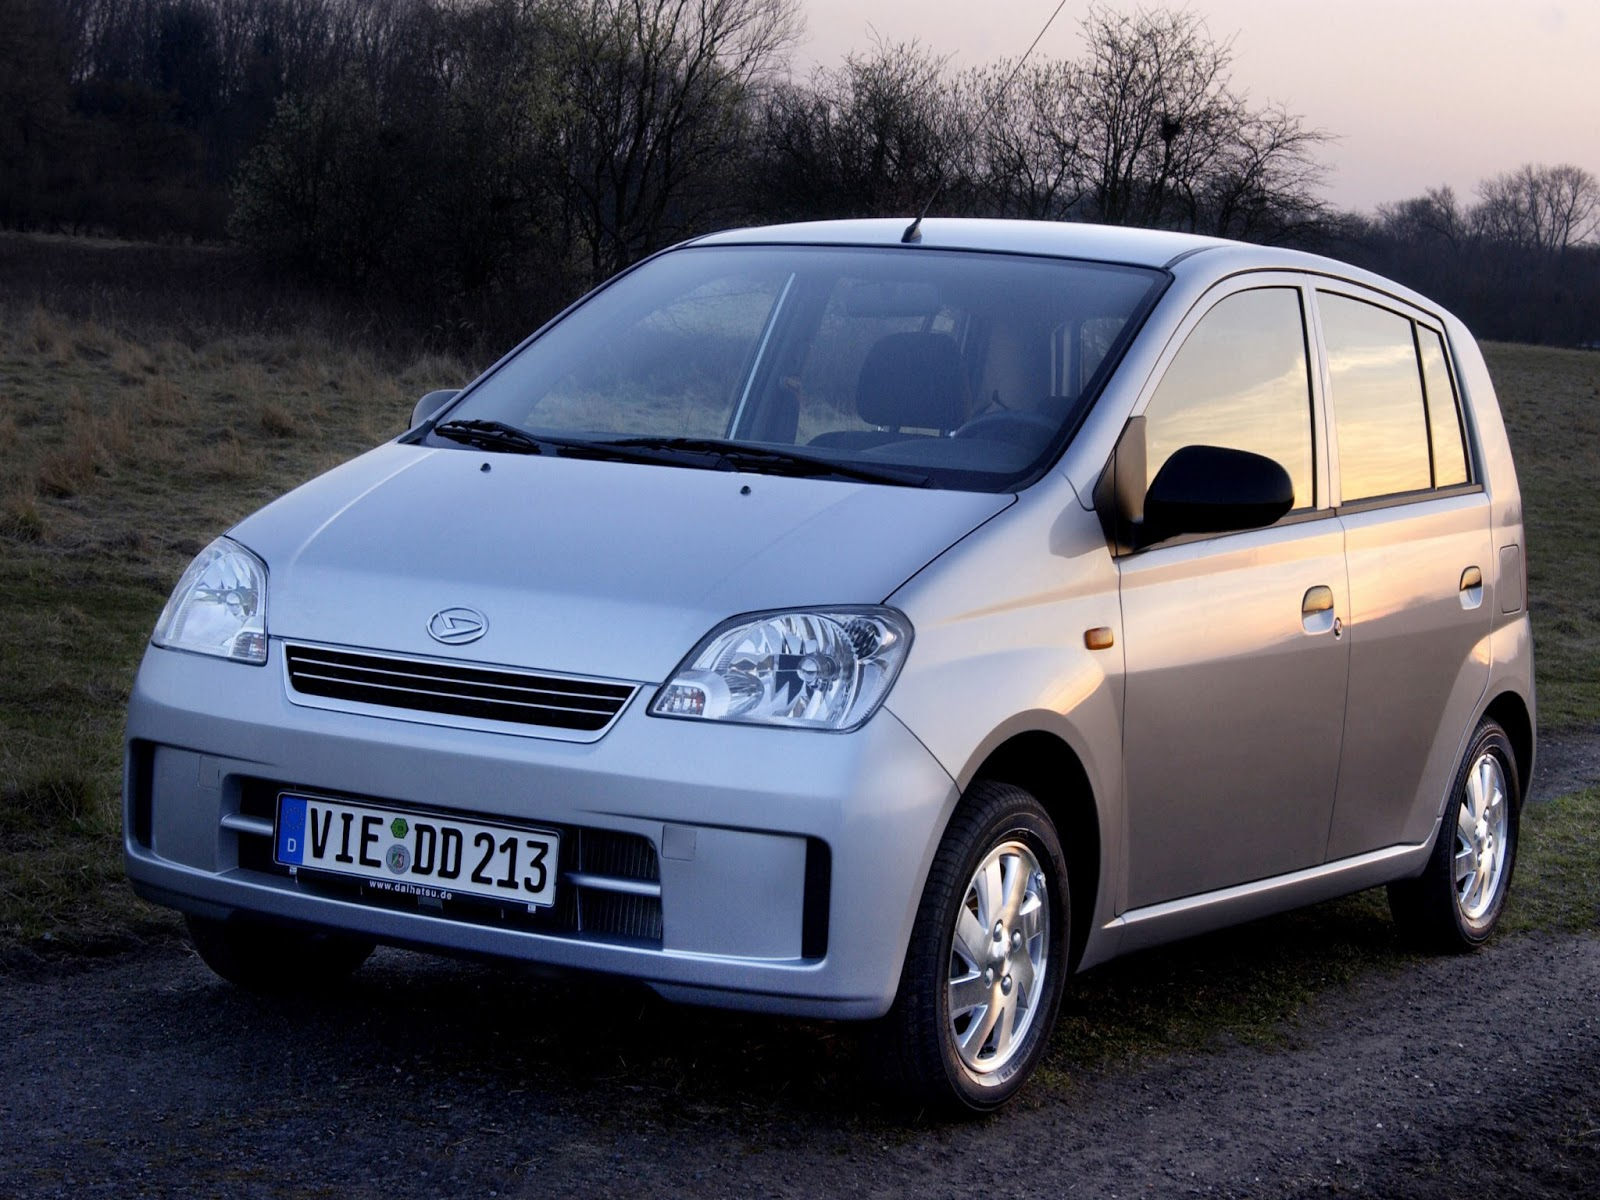 Daihatsu Cuore, L251, mały samochód